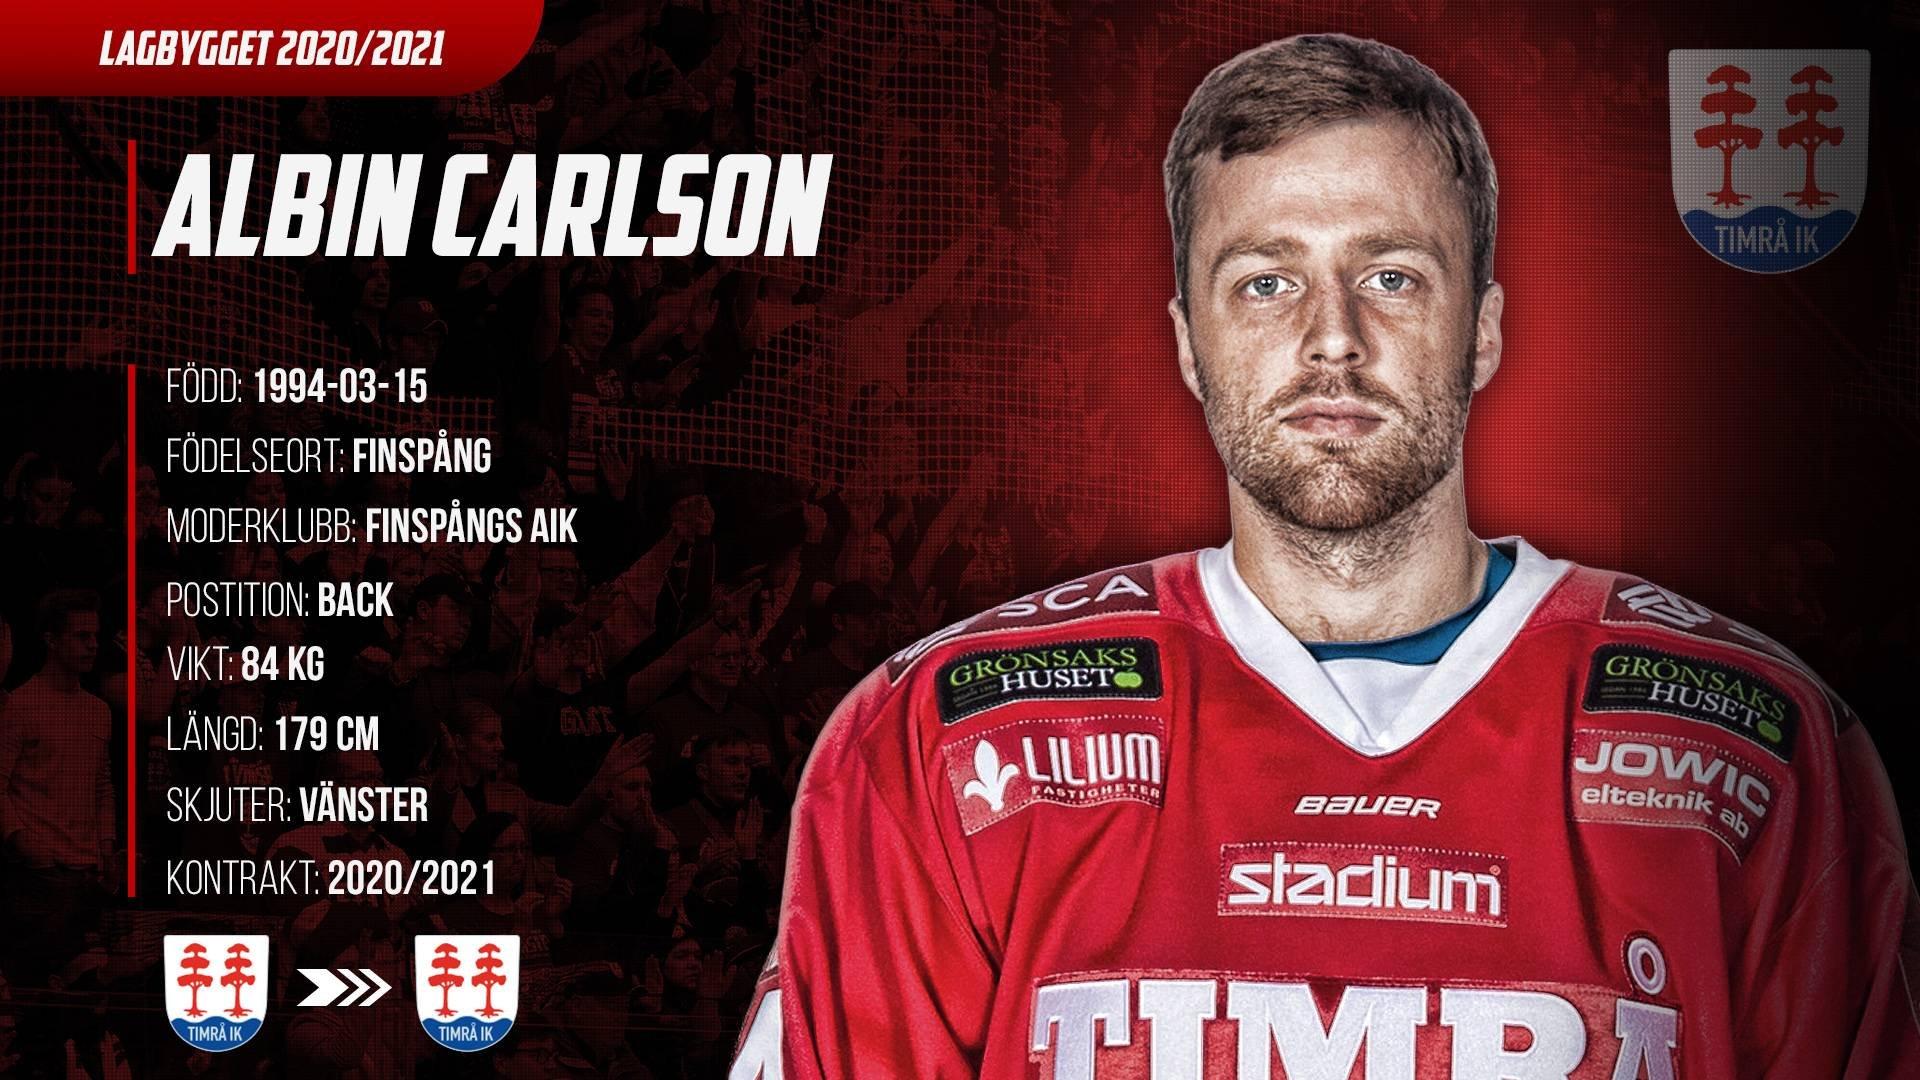 Albin Carlson highlights